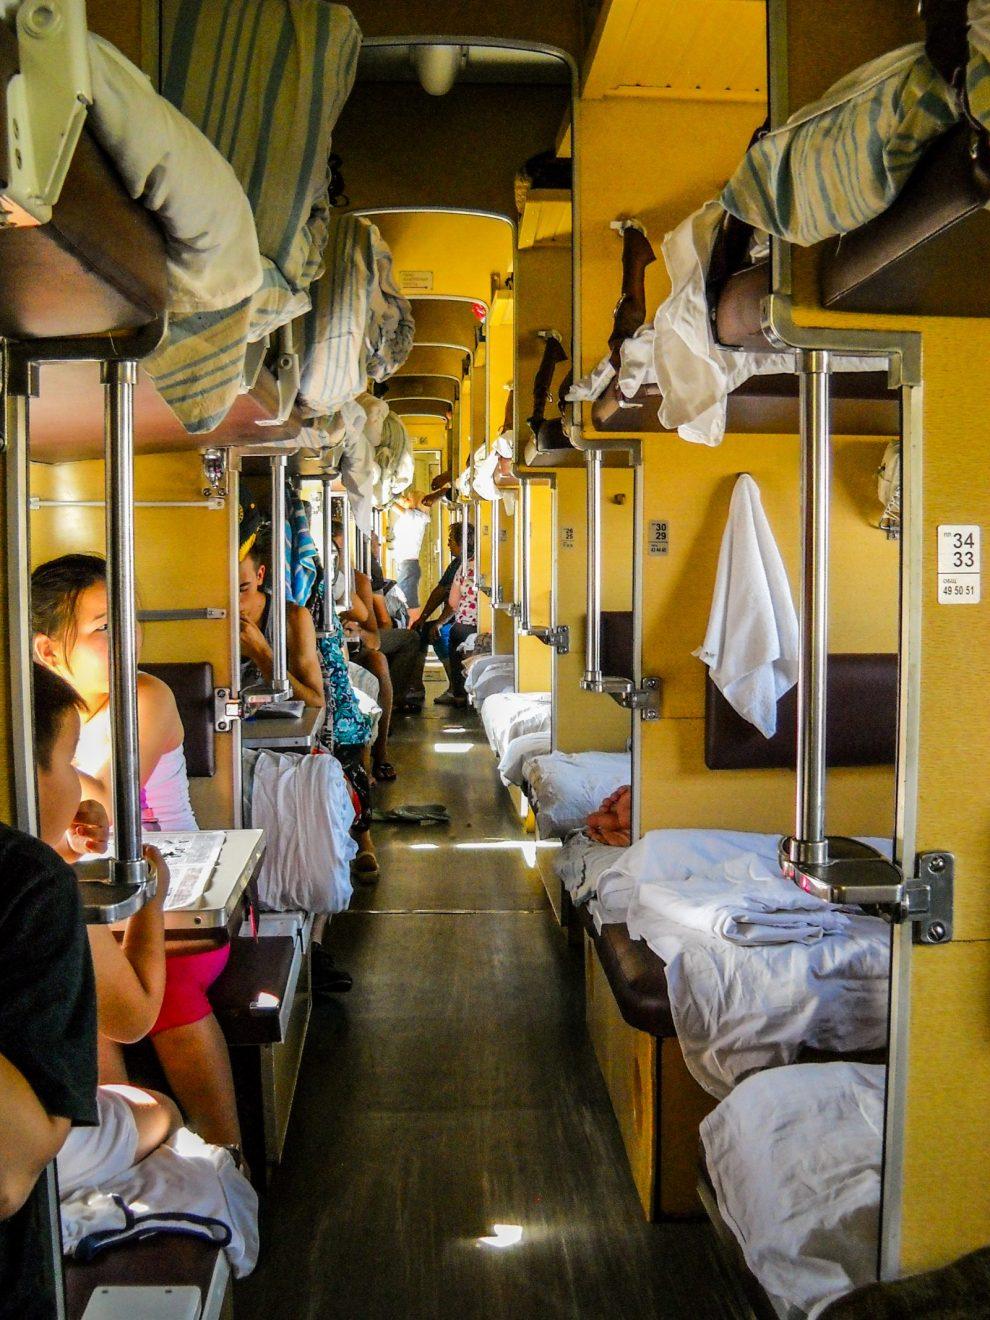 Plackartni - transibirski voz